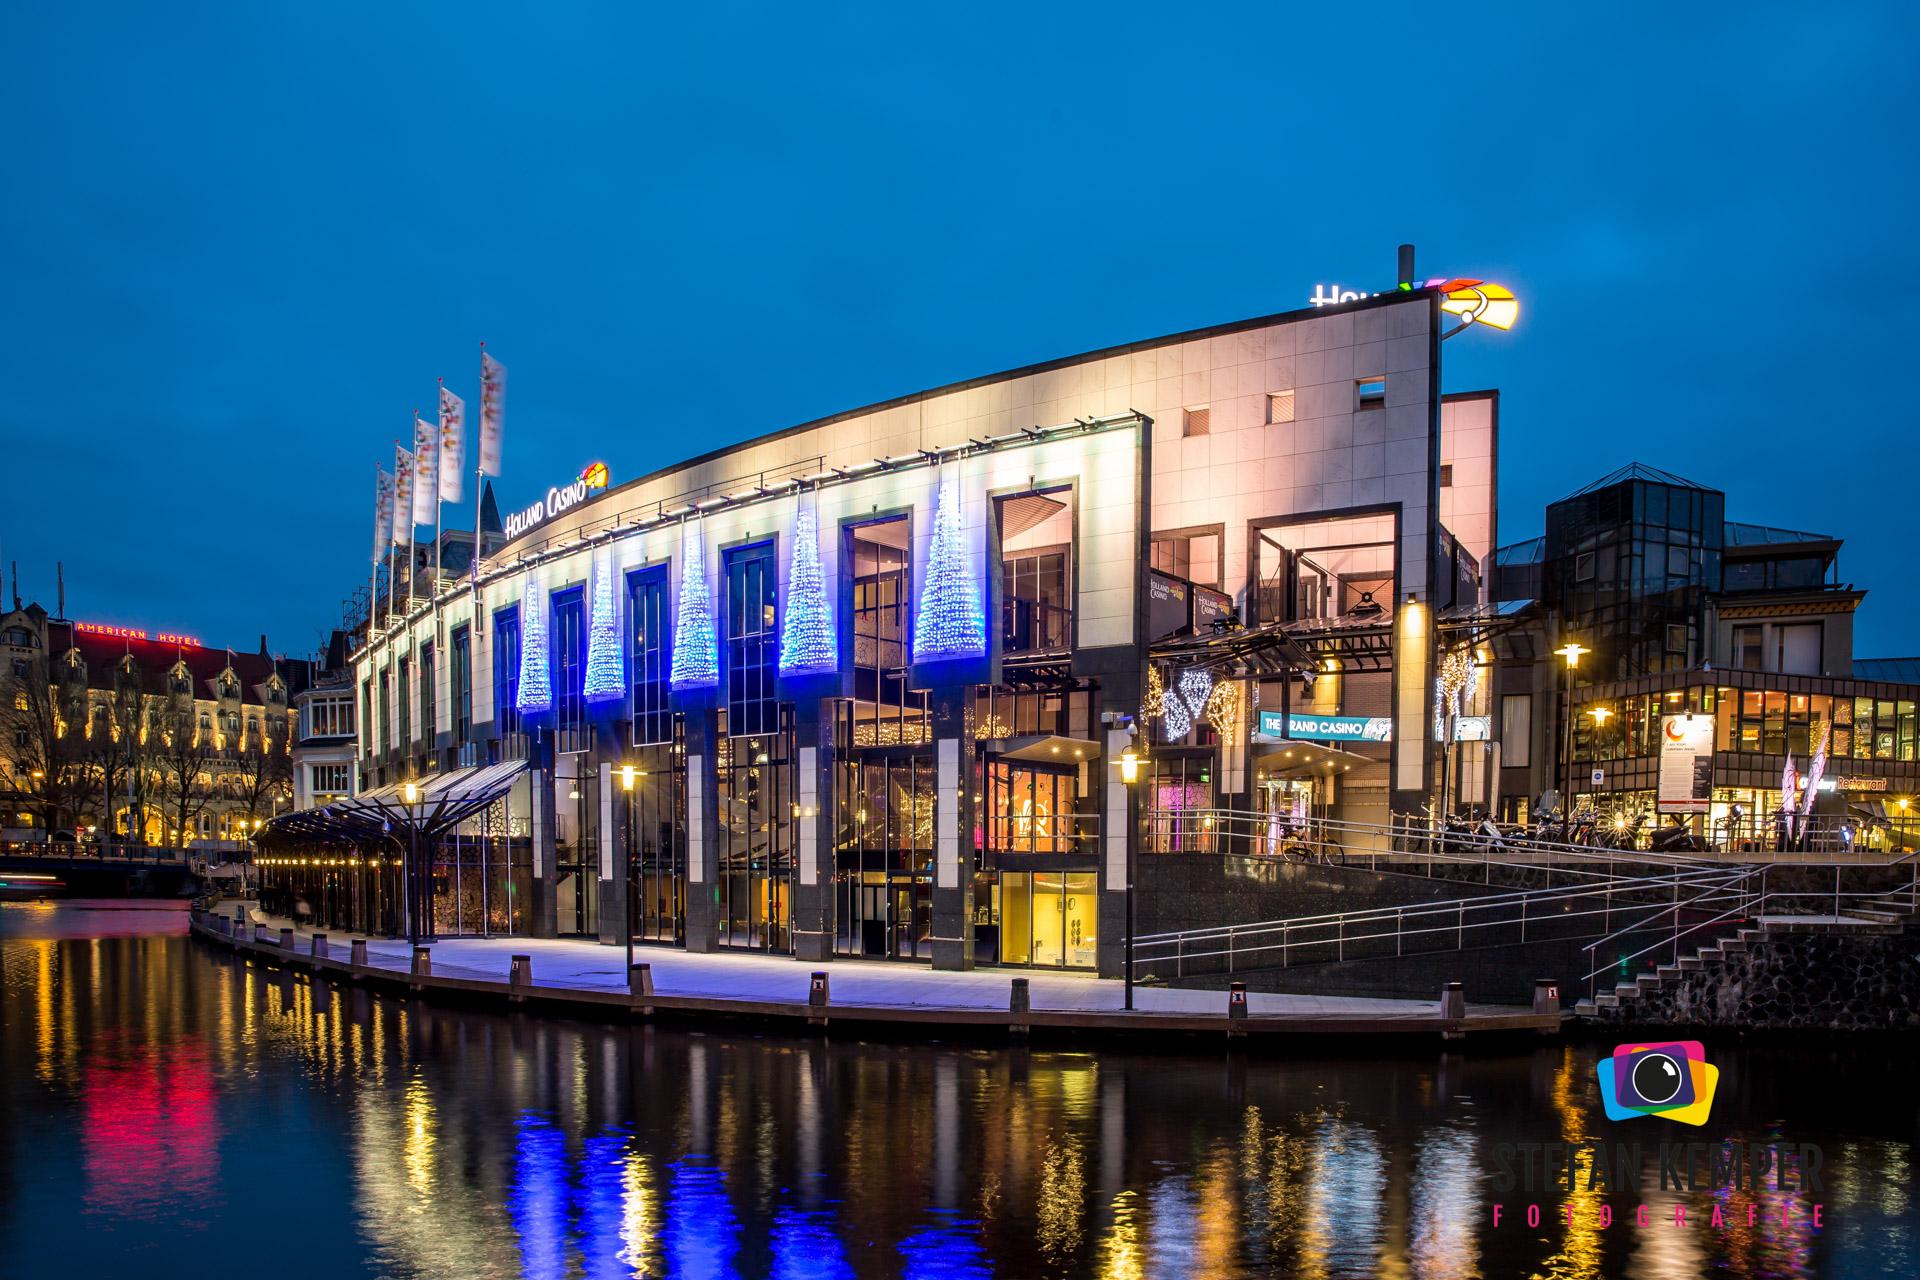 Holland casino Amsterdam kerstverlichting